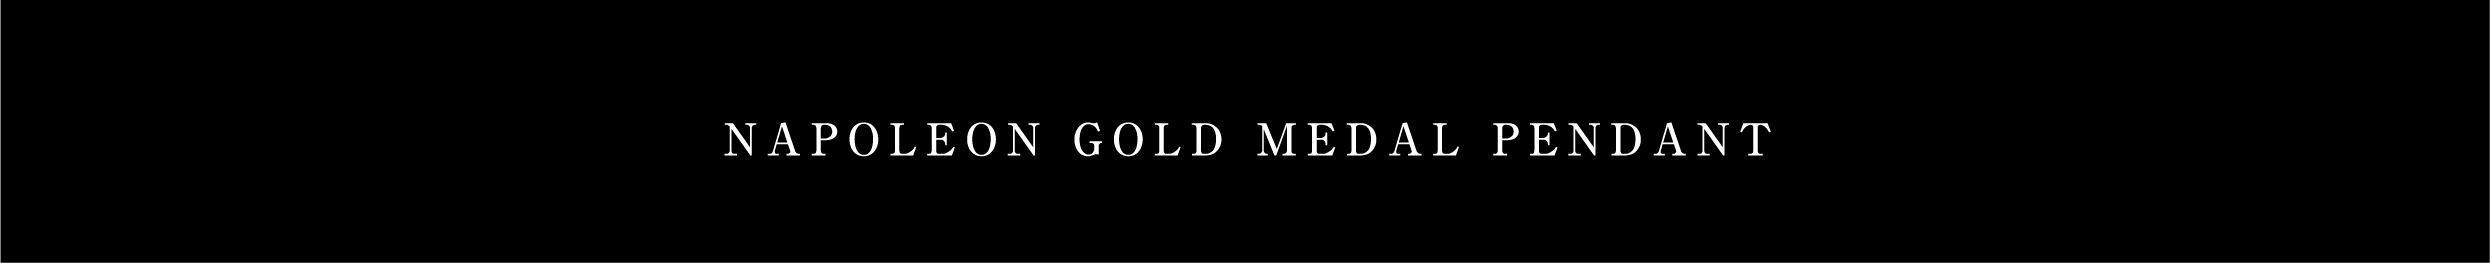 NAPOLEON GOLD MEDAL PENDANT